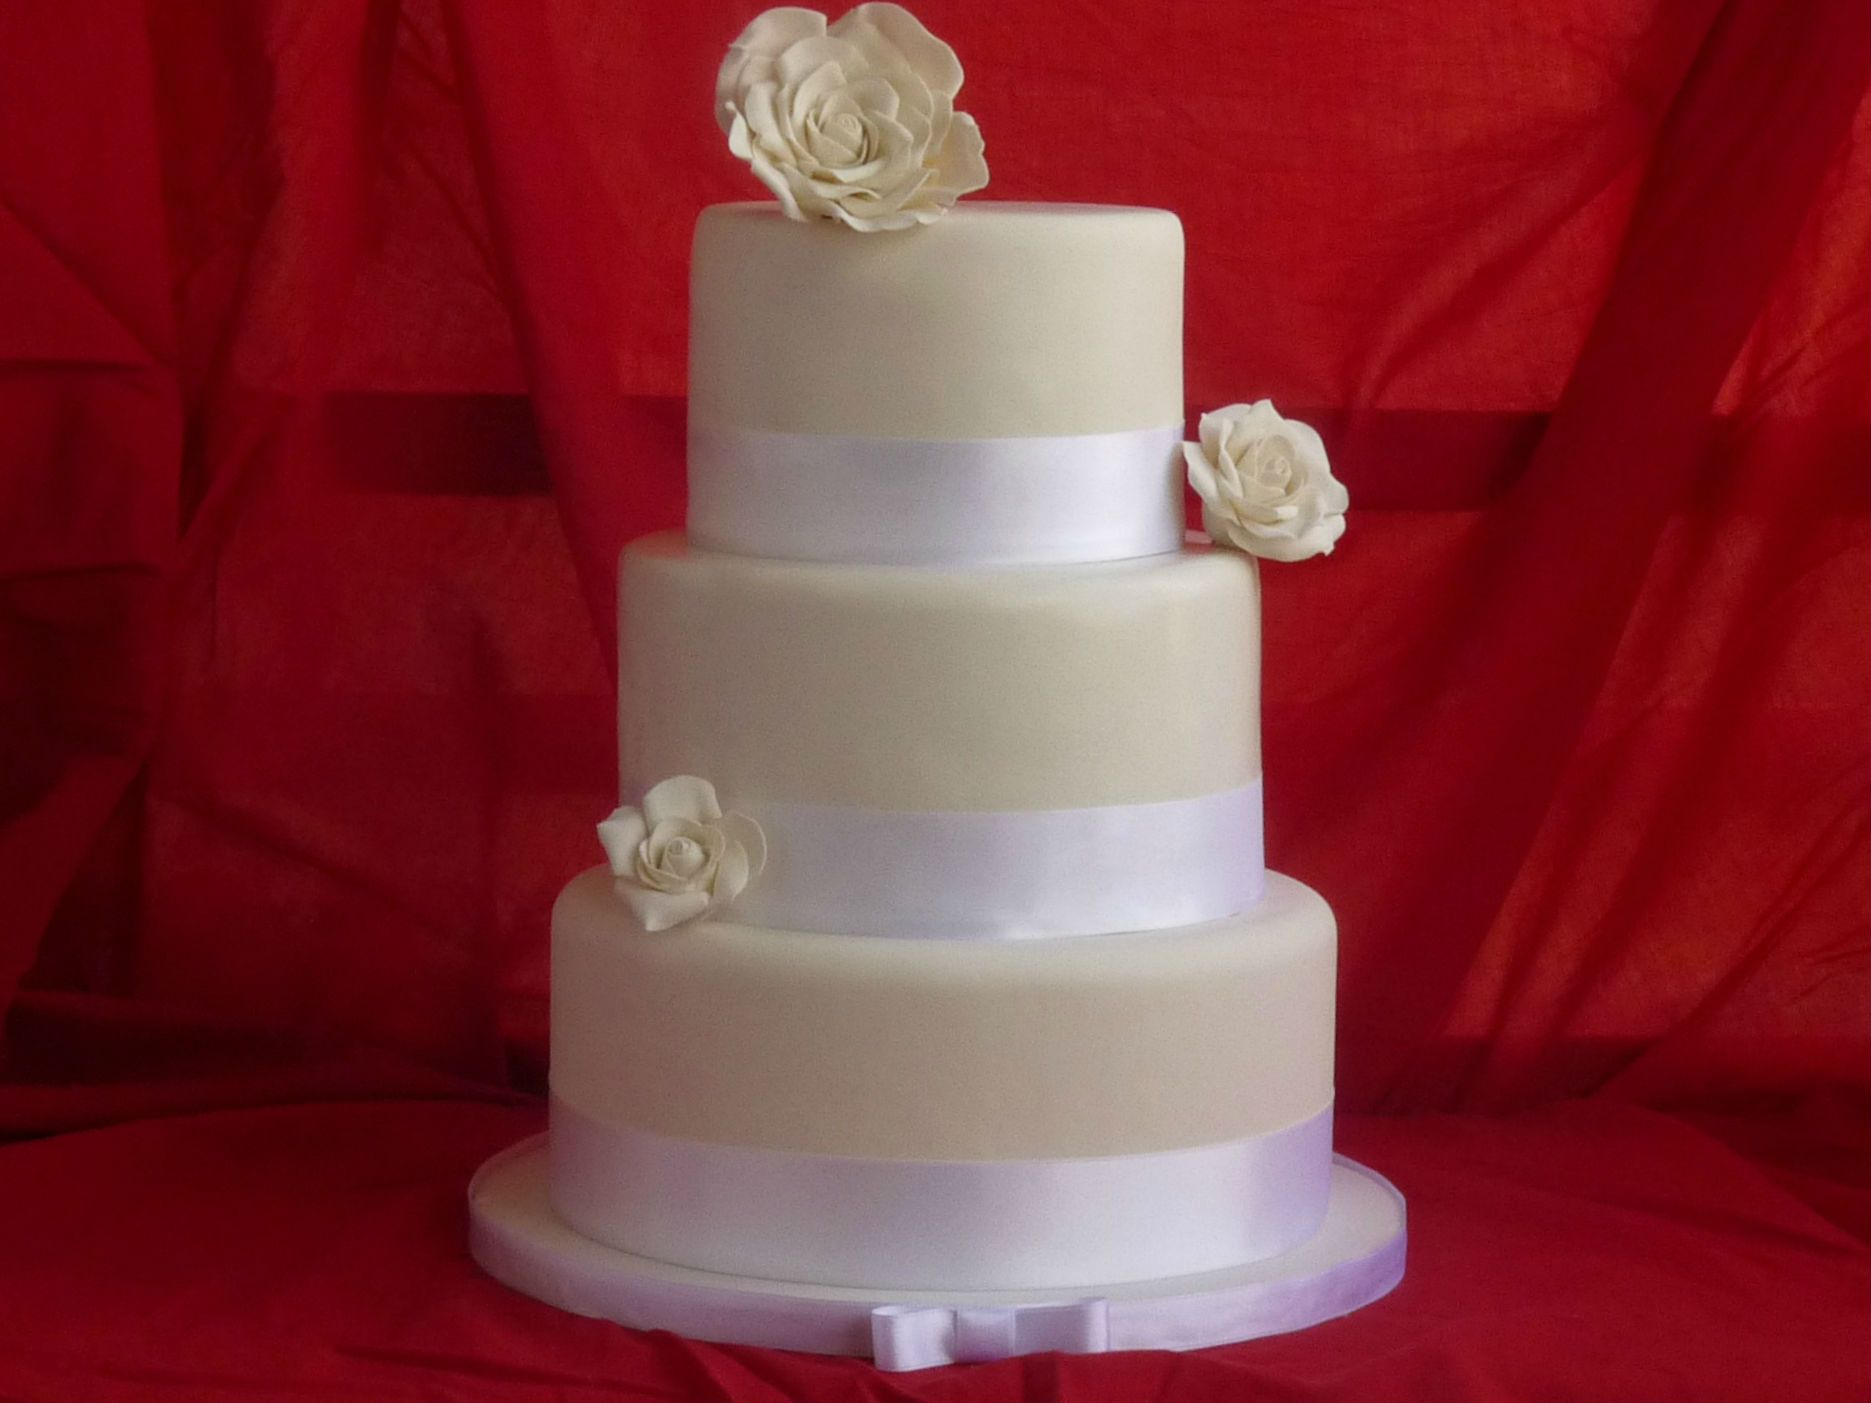 Tarta de Boda Tres Rosas - Flores en pasta de goma - White Gumpaste Roses wedding cake - By Lola Gonzalez